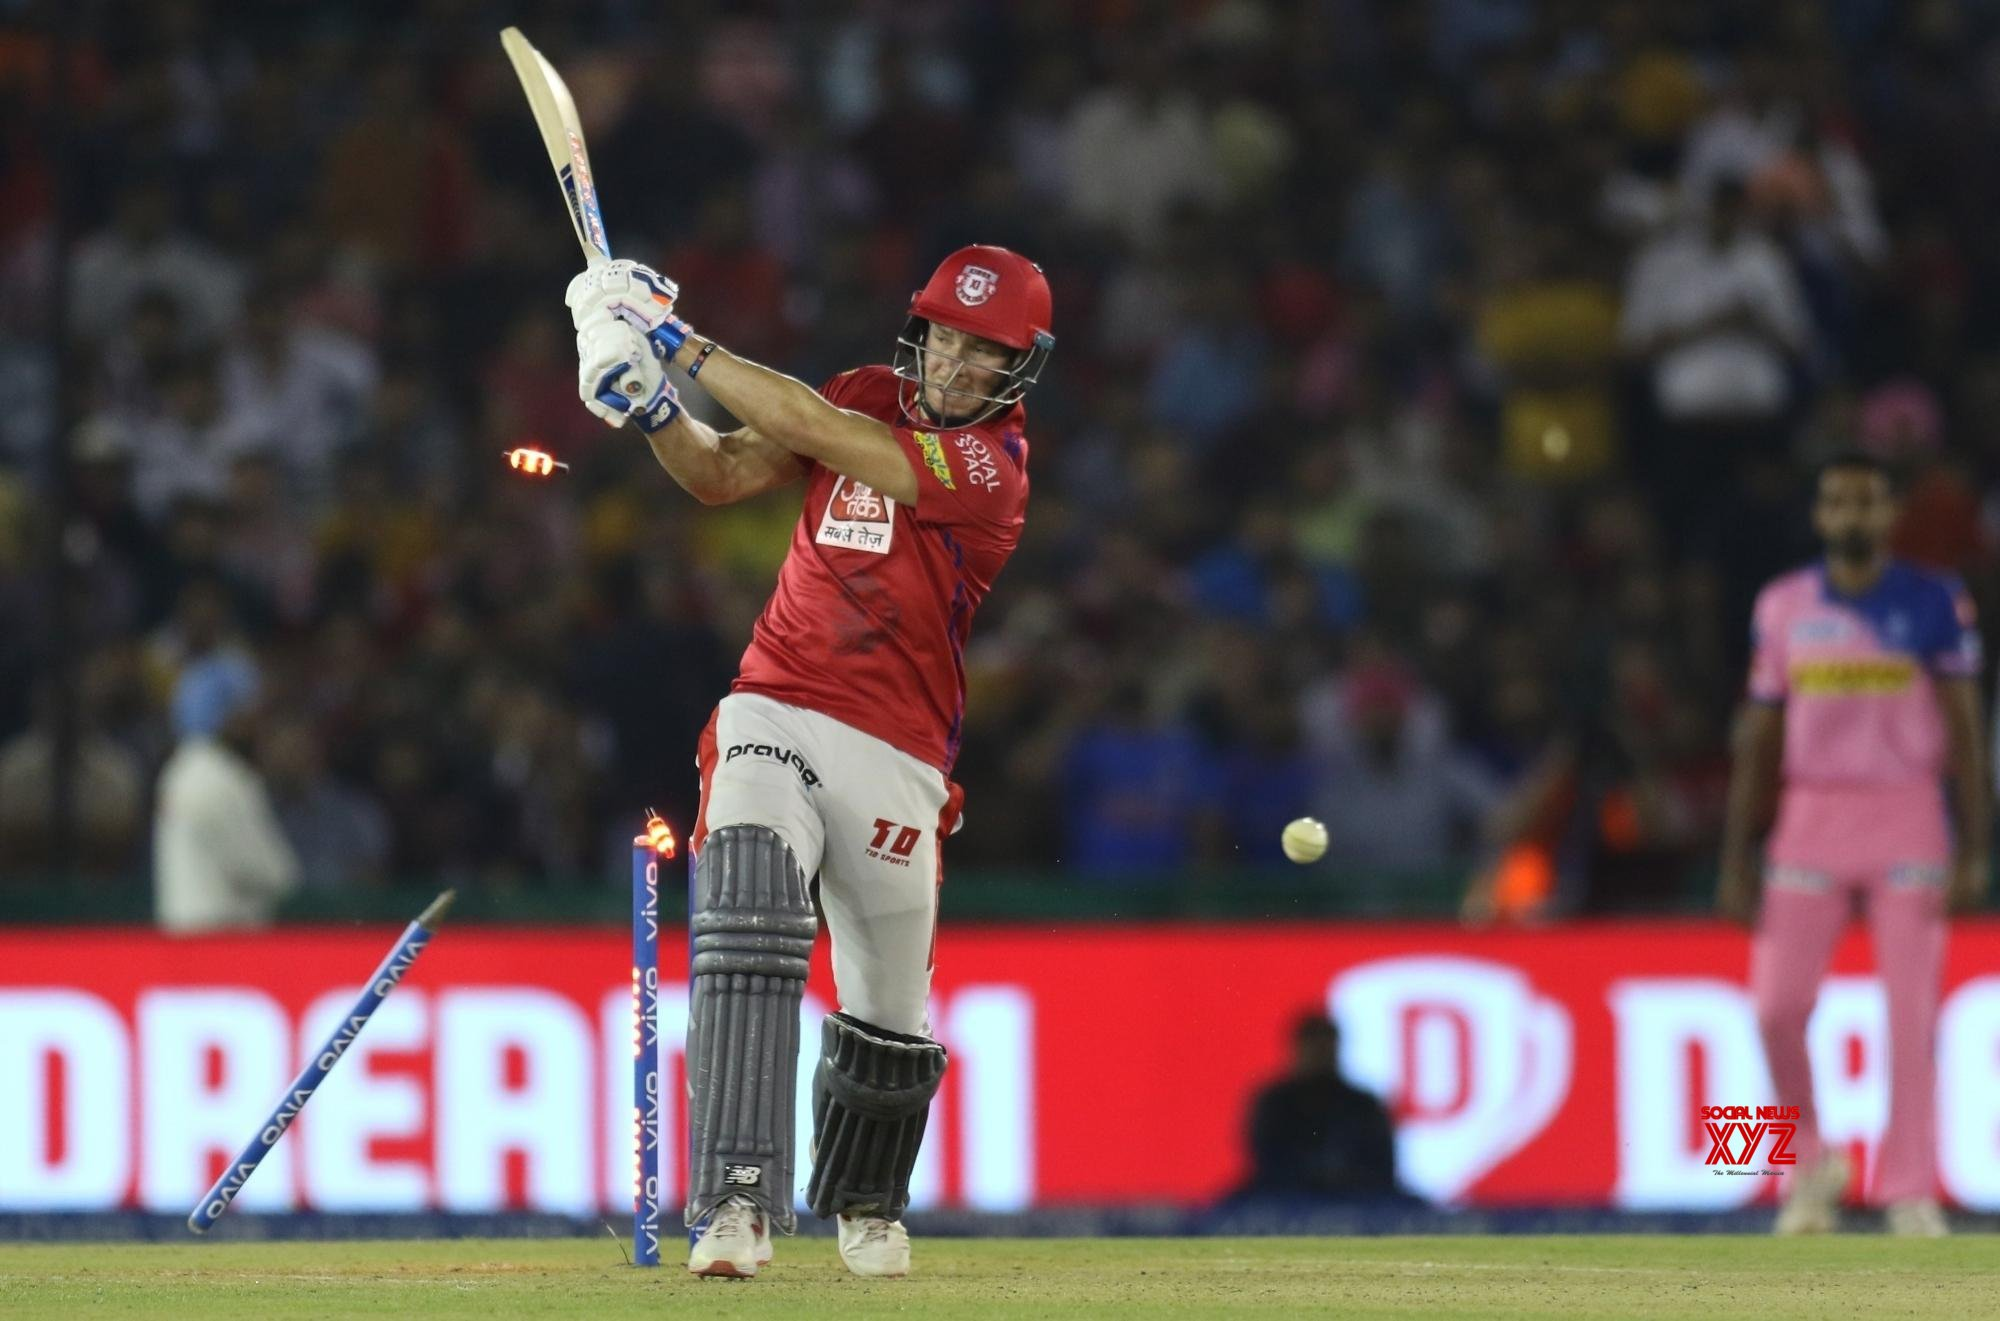 Mohali: IPL 2019 - Match 32 - Kings XI Punjab Vs Rajasthan Royals (Batch - 16) #Gallery